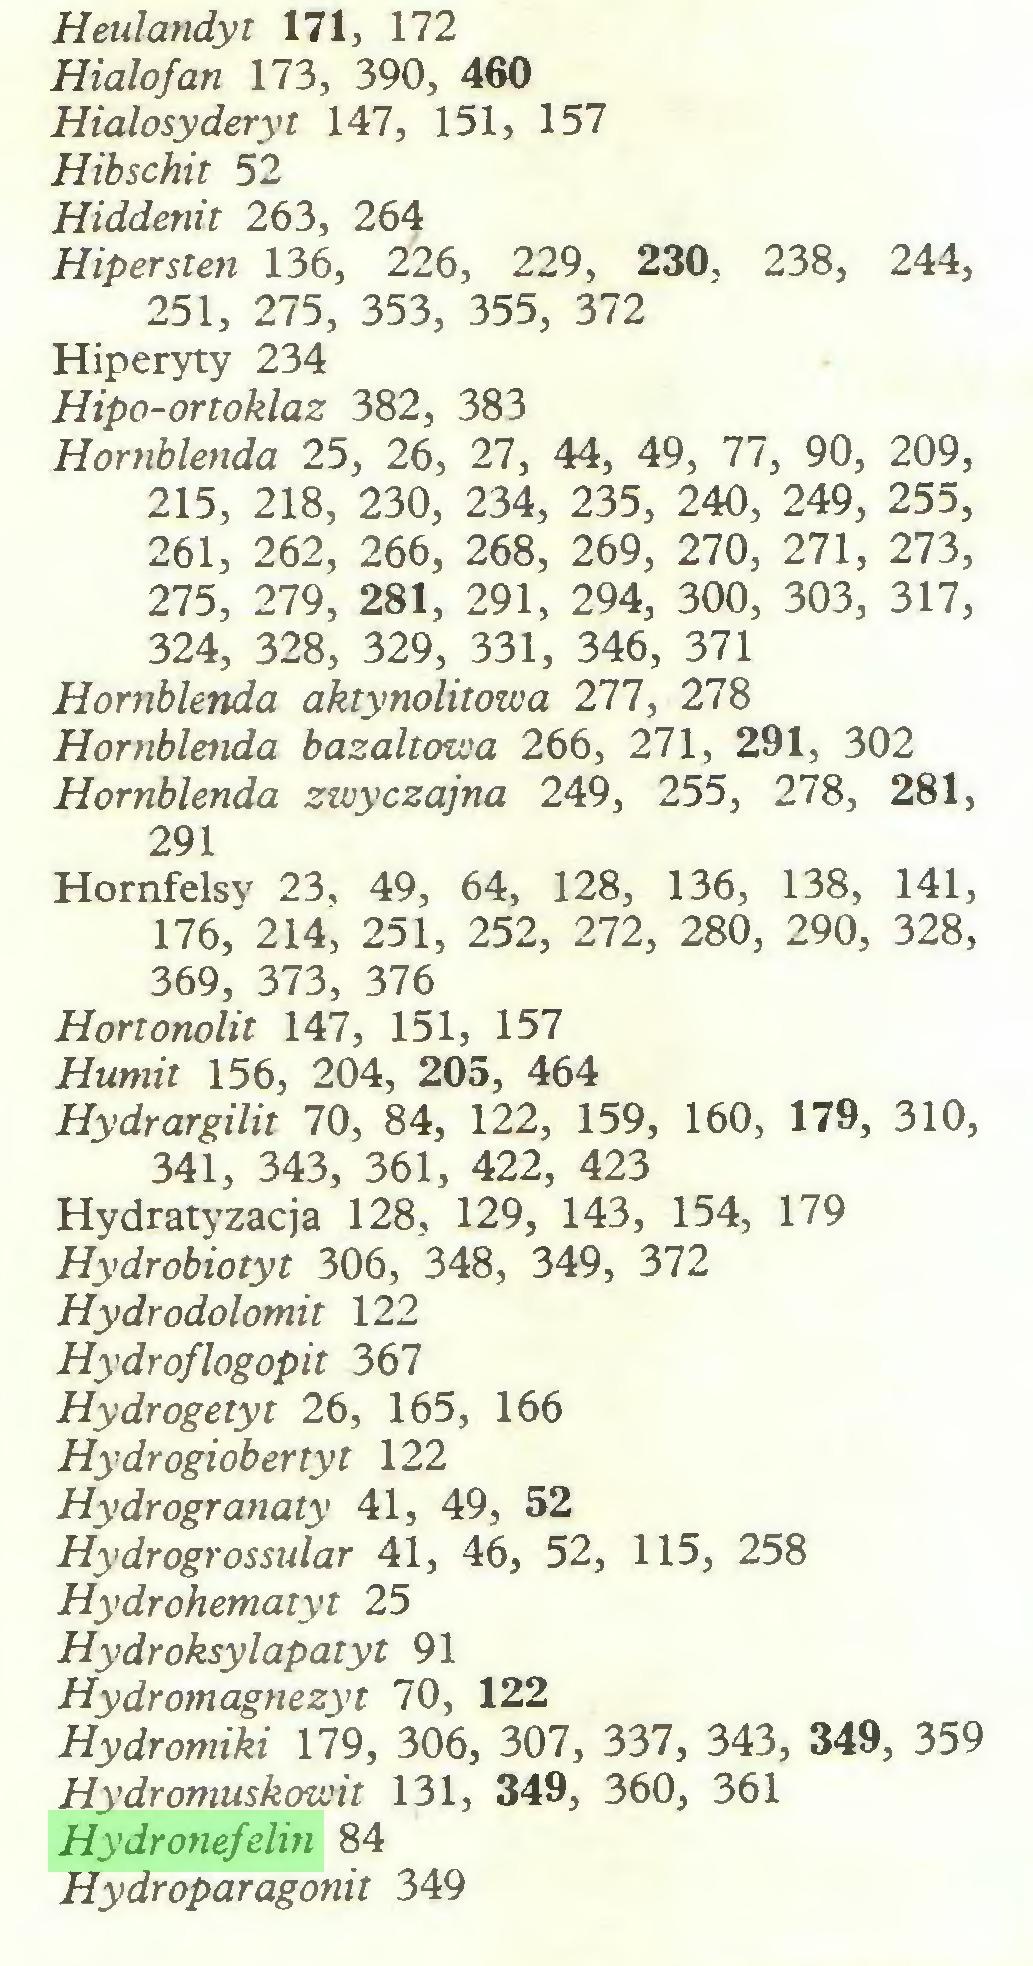 (...) Hialofan 173, 390, 460 Hialosyderyt 147, 151, 157 Hibschit 52 Hiddenit 263, 264 Hipersten 136, 226, 229, 230, 238, 244, 251, 275, 353, 355, 372 Hiperyty 234 Hipo-ortoklaz 382, 383 Hornblenda 25, 26, 27, 44, 49, 77, 90, 209, 215, 218, 230, 234, 235, 240, 249, 255, 261, 262, 266, 268, 269, 270, 271, 273, 275, 279, 281, 291, 294, 300, 303, 317, 324, 328, 329, 331, 346, 371 Hornblenda aktynolitowa 277, 278 Hornblenda bazaltowa 266, 271, 291, 302 Hornblenda zwyczajna 249, 255, 278, 281, 291 Hornfelsy 23, 49, 64, 128, 136, 138, 141, 176, 214, 251, 252, 272, 280, 290, 328, 369, 373, 376 Hortonolit 147, 151, 157 Humit 156, 204, 205, 464 Hydrargilit 70, 84, 122, 159, 160, 179, 310, 341, 343, 361, 422, 423 Hydratyzacja 128, 129, 143, 154, 179 Hydrobiotyt 306, 348, 349, 372 Hydrodolomit 122 Hydroflogopit 367 Hydrogetyt 26, 165, 166 Hydrogiobertyt 122 Hydrogranaty 41, 49, 52 Hydrogrossular 41, 46, 52, 115, 258 Hydrohematyt 25 Hydroksylapatyt 91 Hydromagnezyt 70, 122 Hydromiki 179, 306, 307, 337, 343, 349, 359 Hydromuskowit 131, 349, 360, 361 Hydronefelin 84 Hydroparagonit 349...